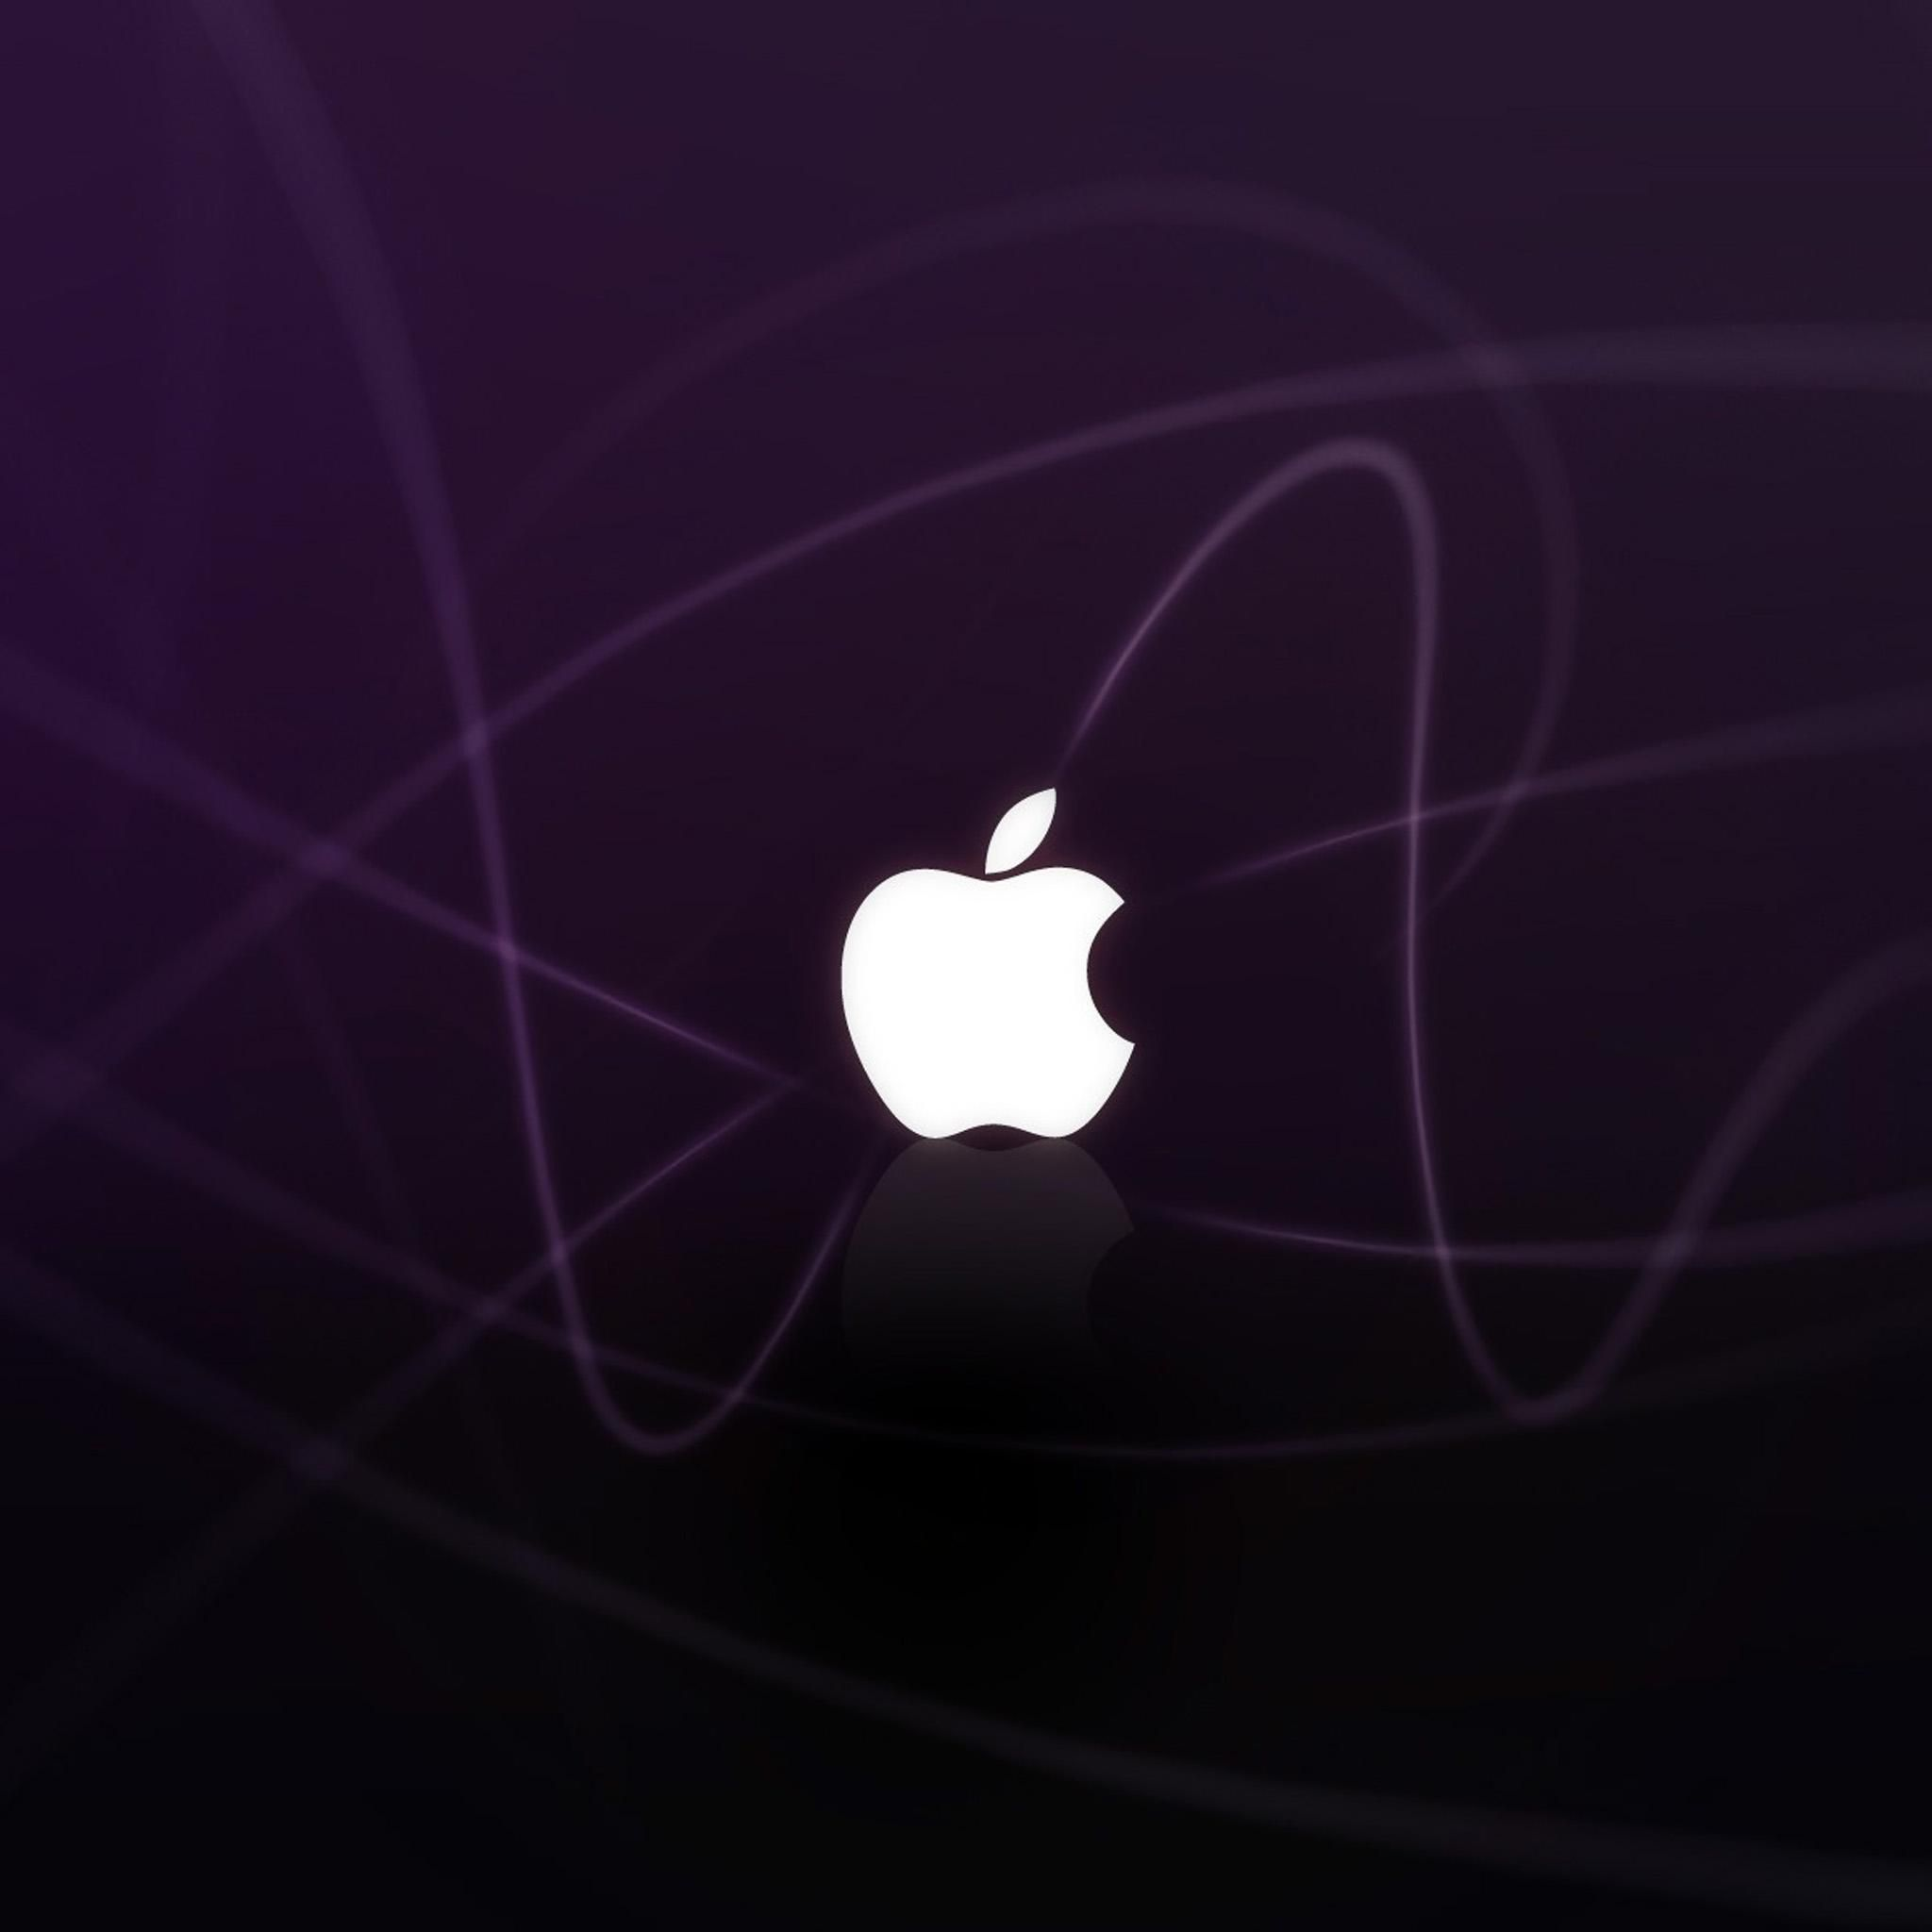 IPad Air Apple Wallpaper